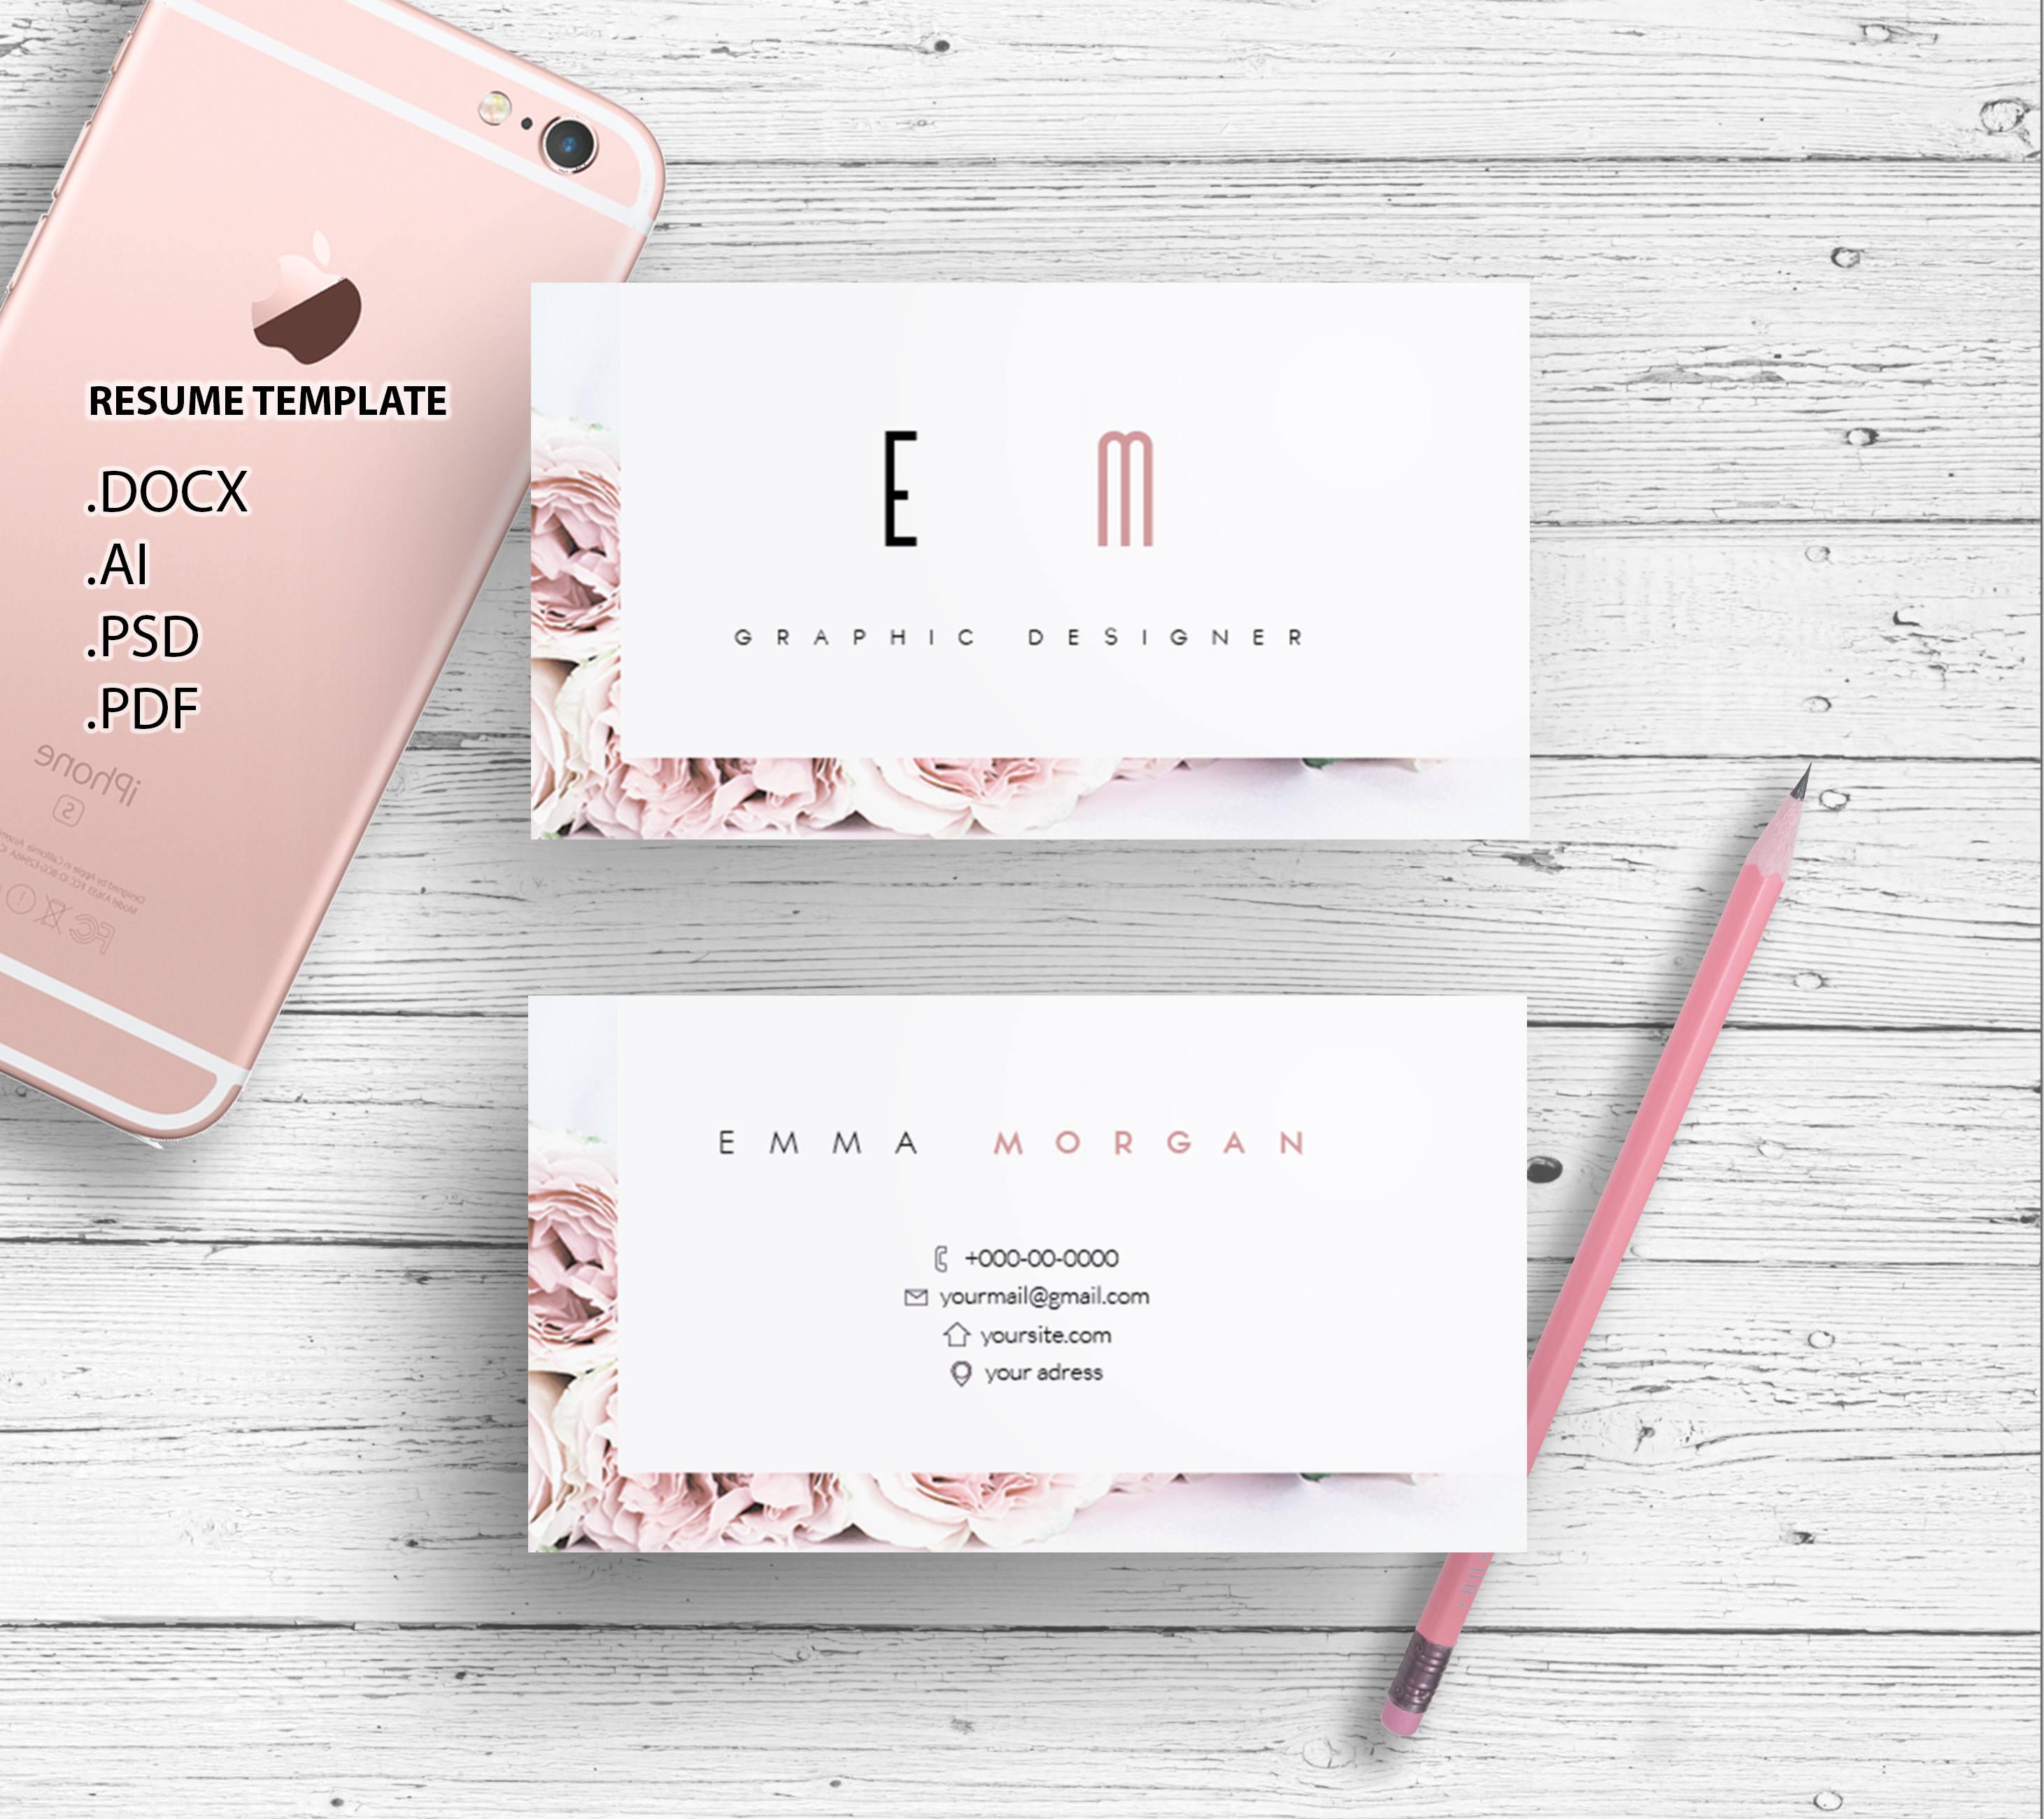 Roses business card template / creative / card design / morden ...